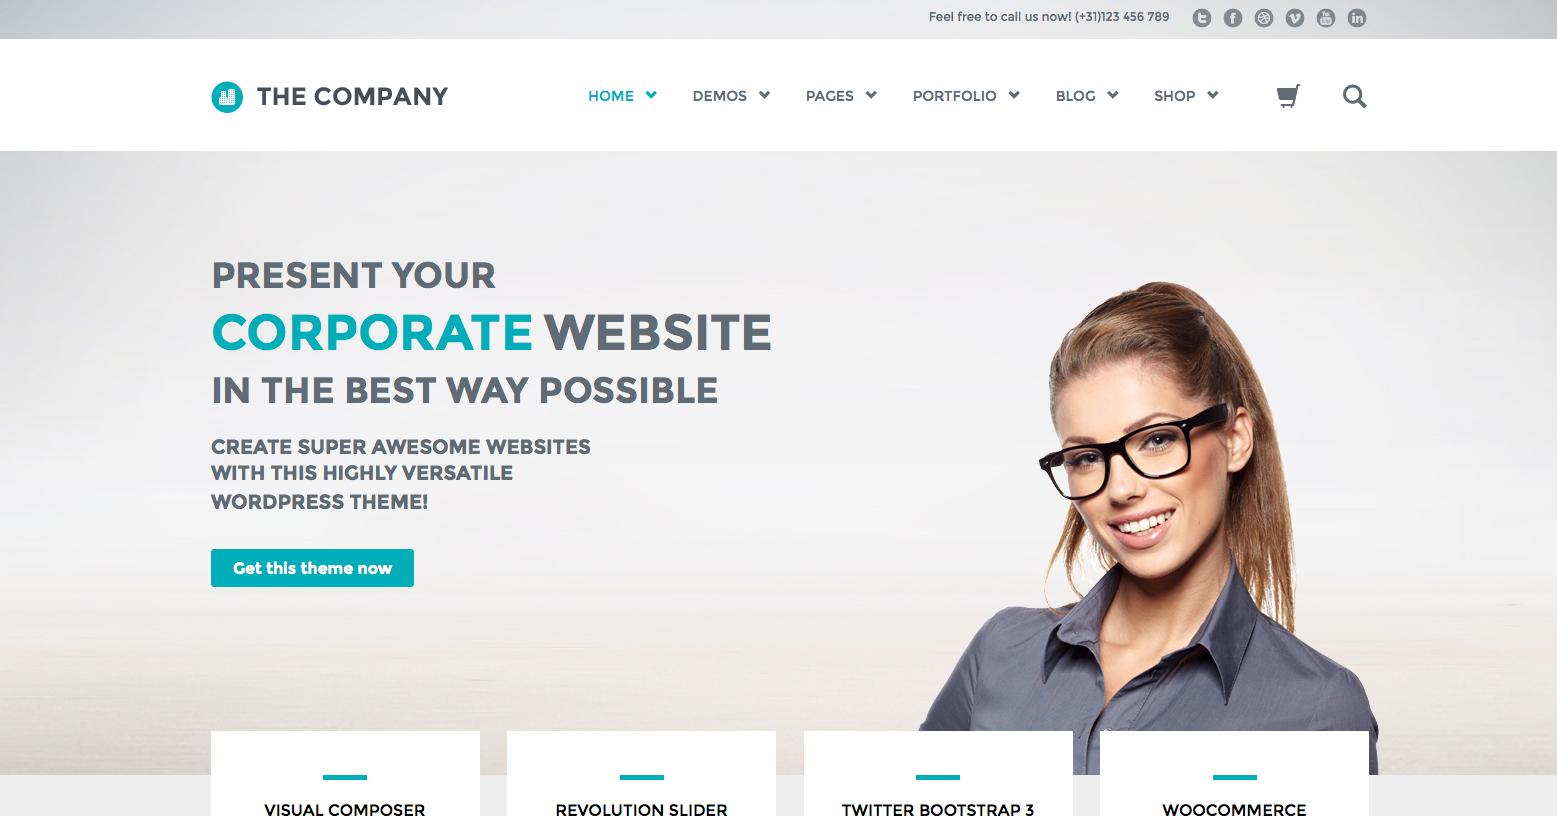 Wordpress Web Themes: The Company - Responsive Multi-Purpose